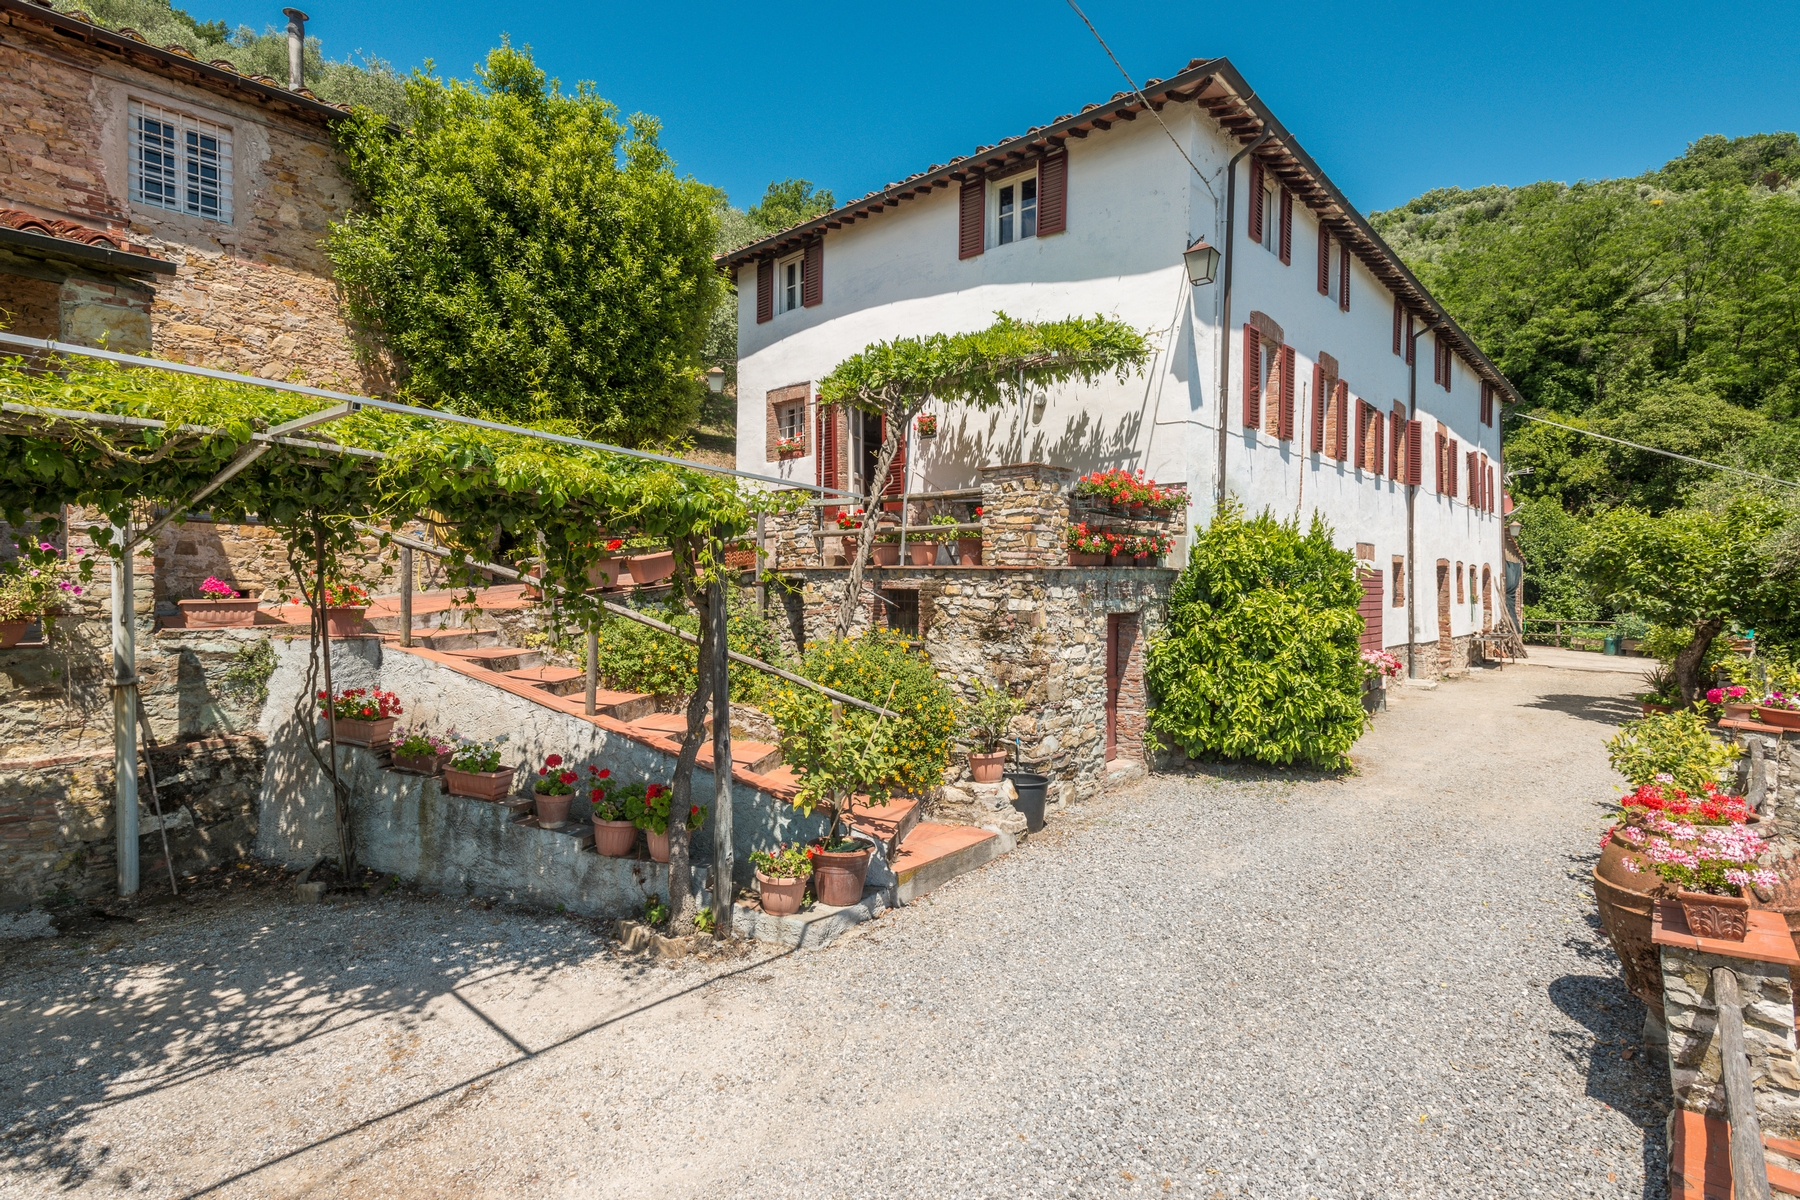 Villa in Vendita a Lucca: 5 locali, 550 mq - Foto 4